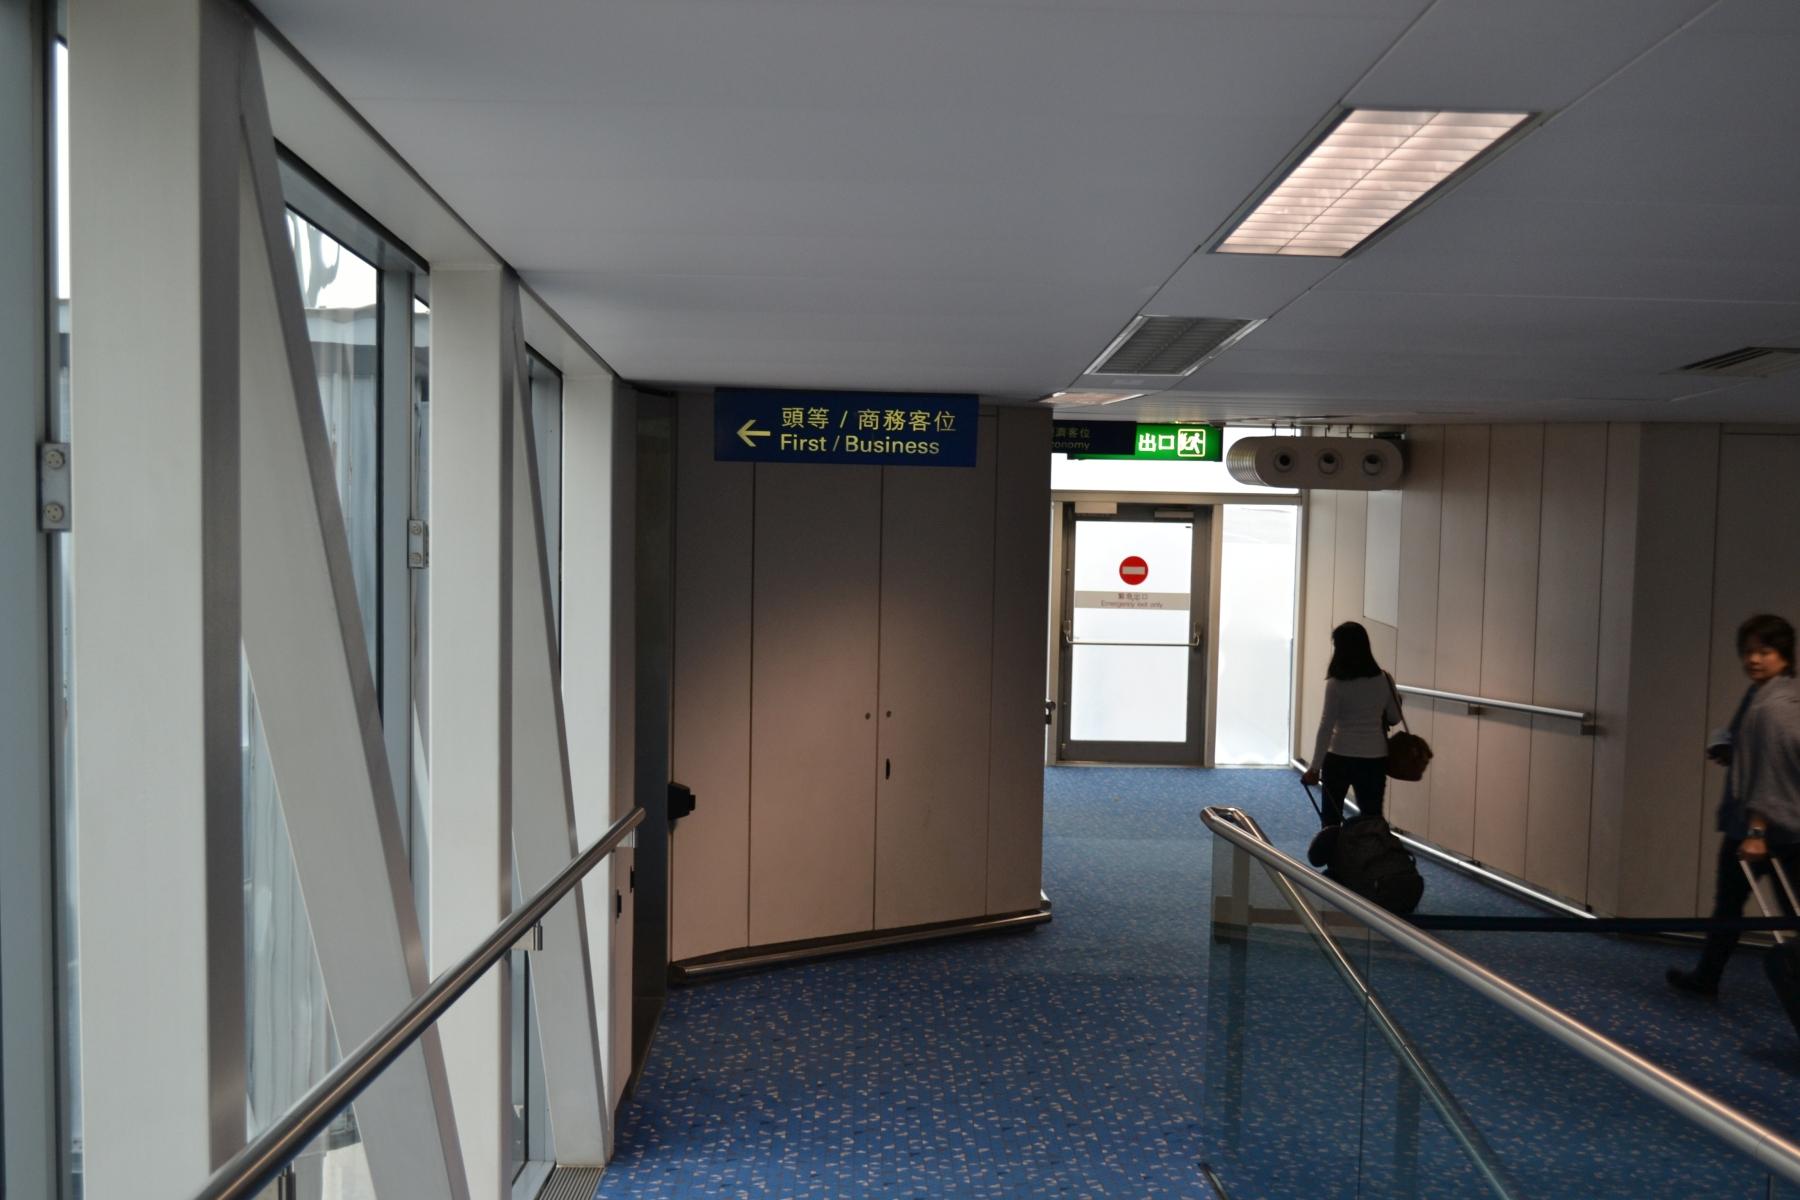 photo HKGCEB-28